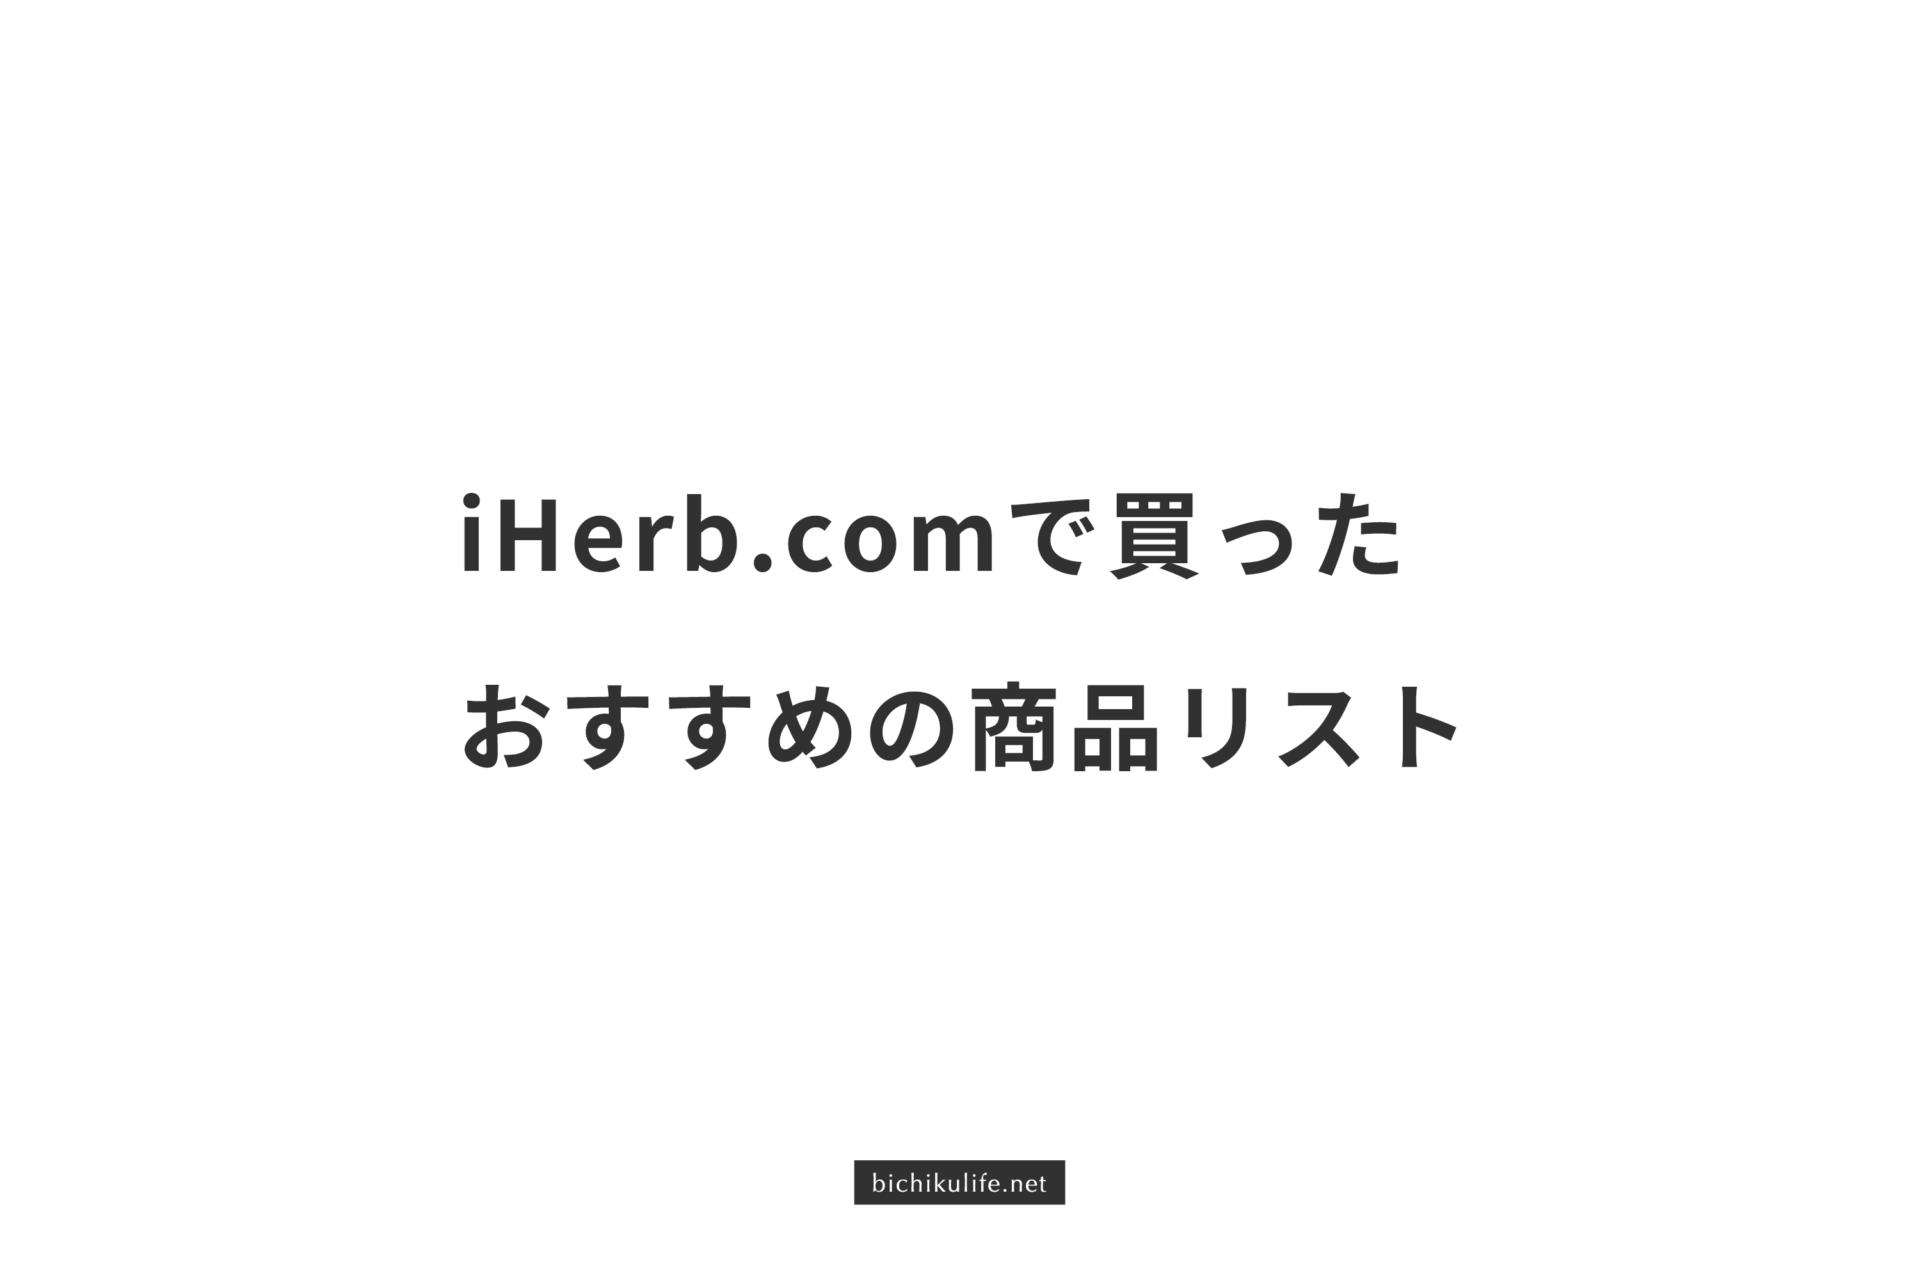 iHerb(アイハーブ)で買ったおすすめ商品